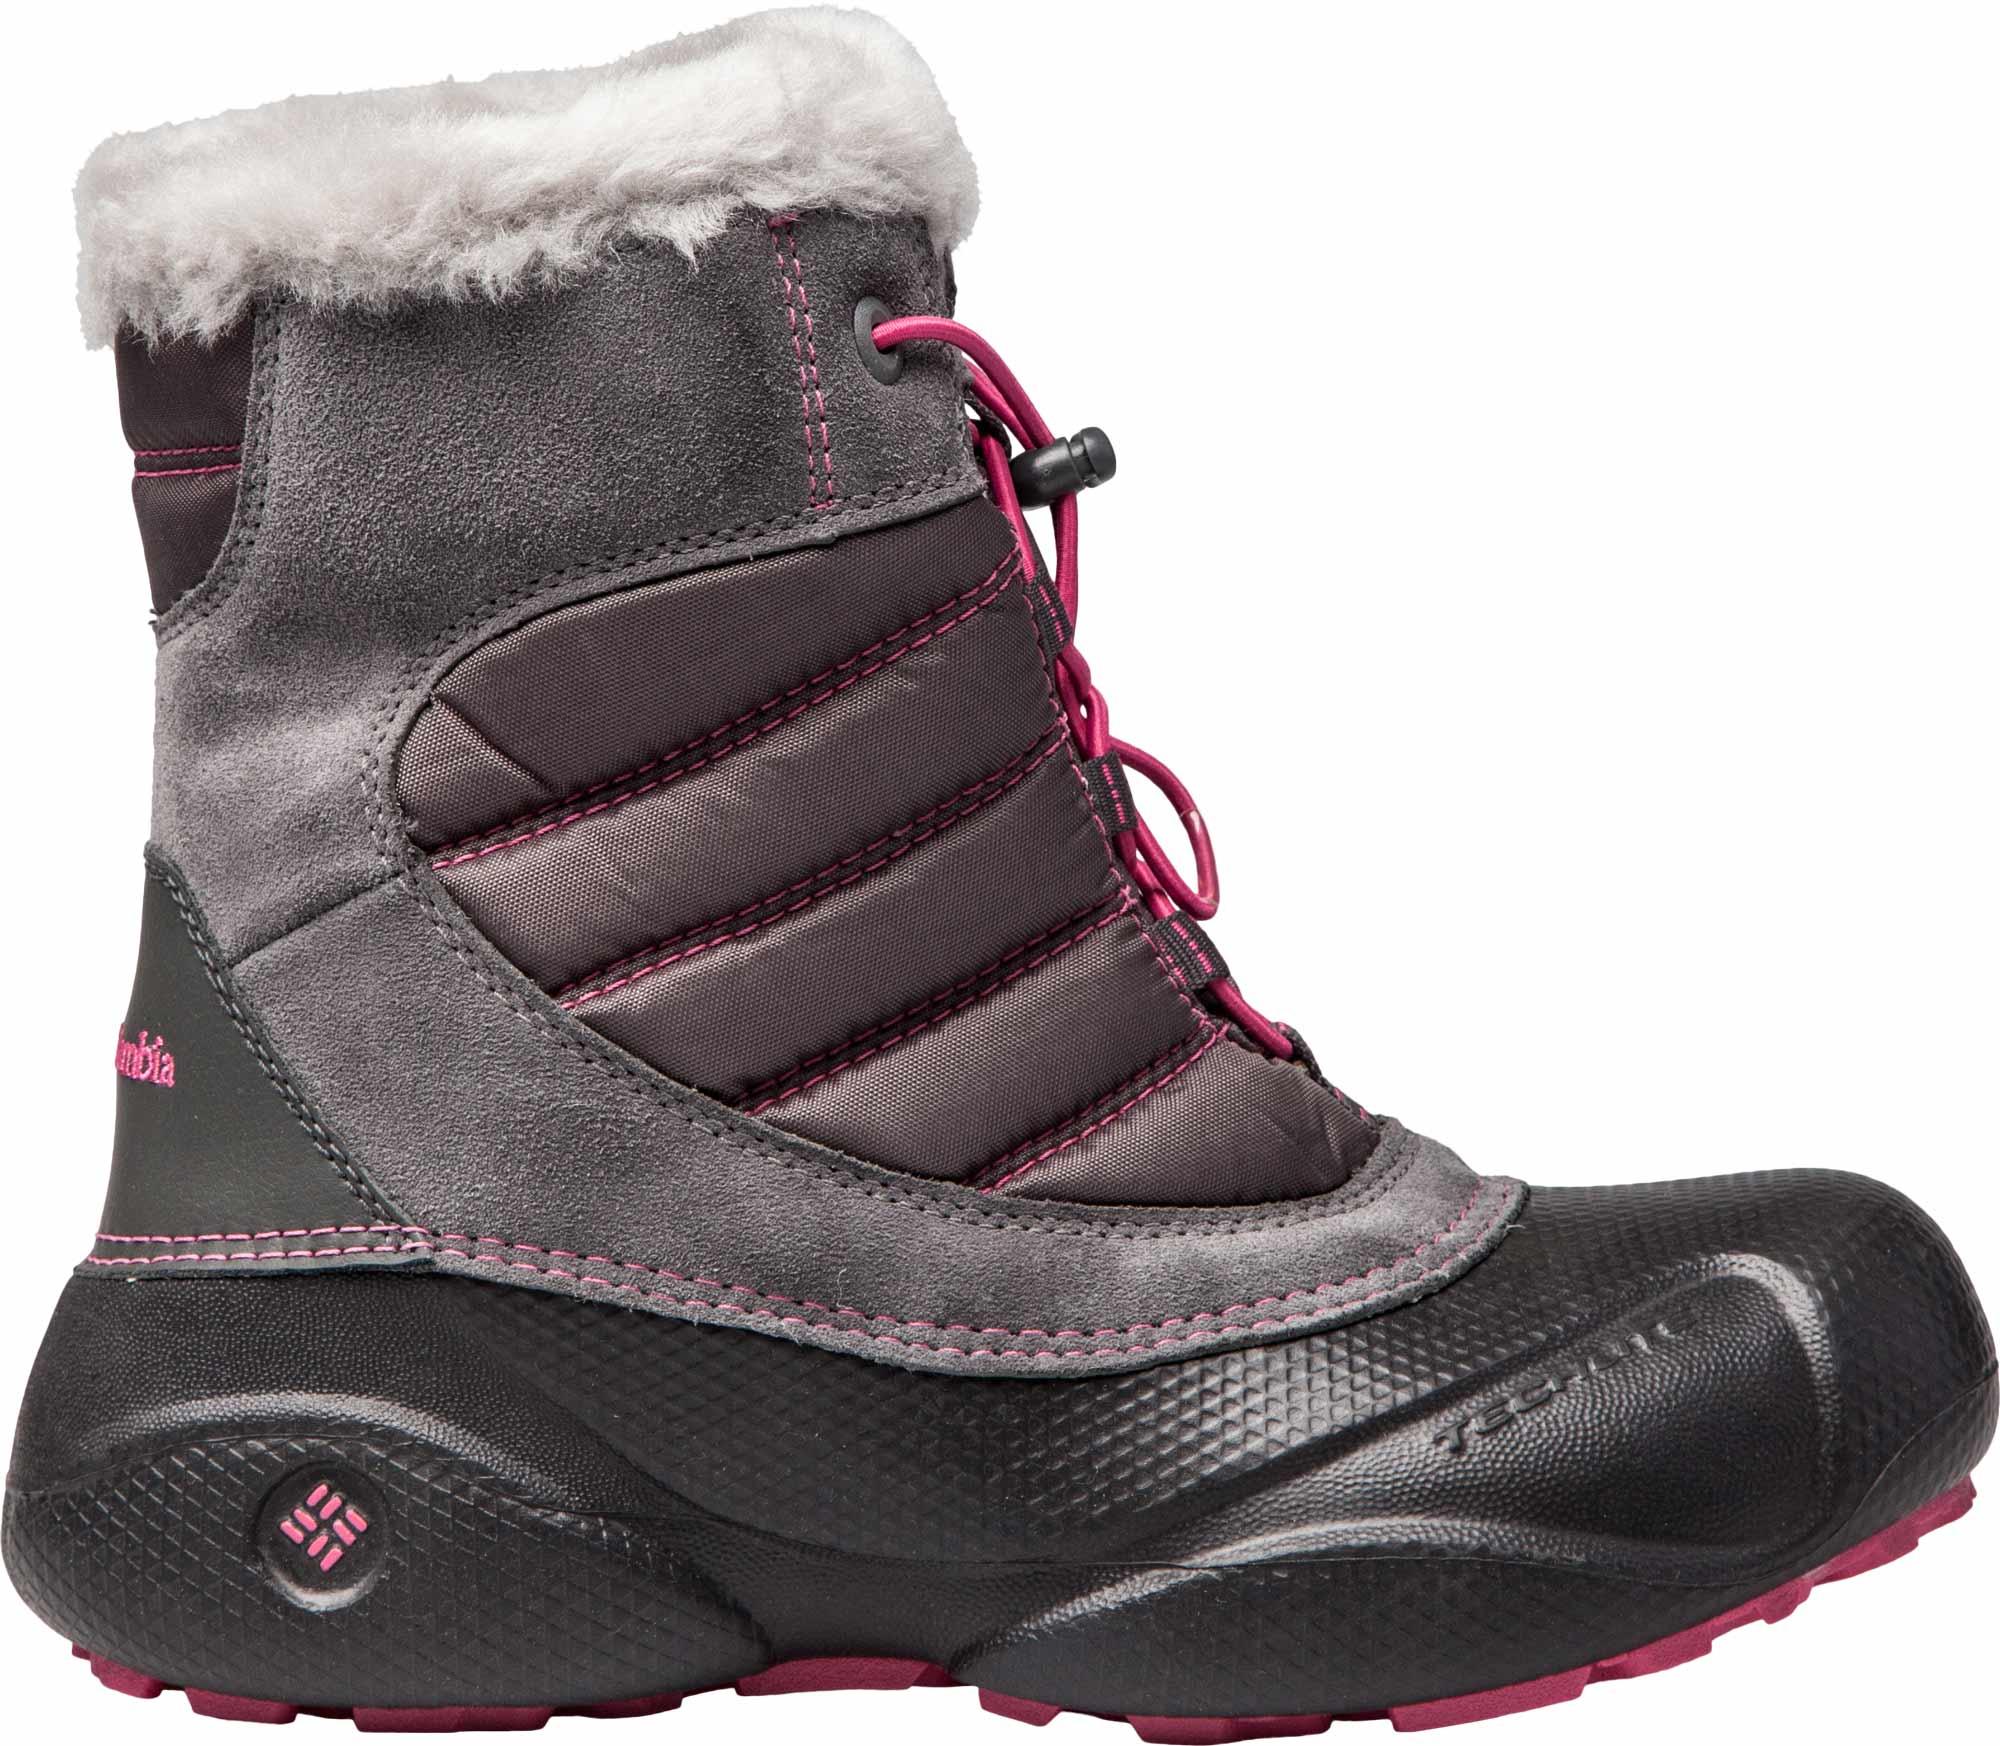 4e8213a6dd907 Columbia YOUTH ROPE TOW JUNIOR. Dětská zimní obuv. Dětská zimní obuv. Dětská  zimní obuv